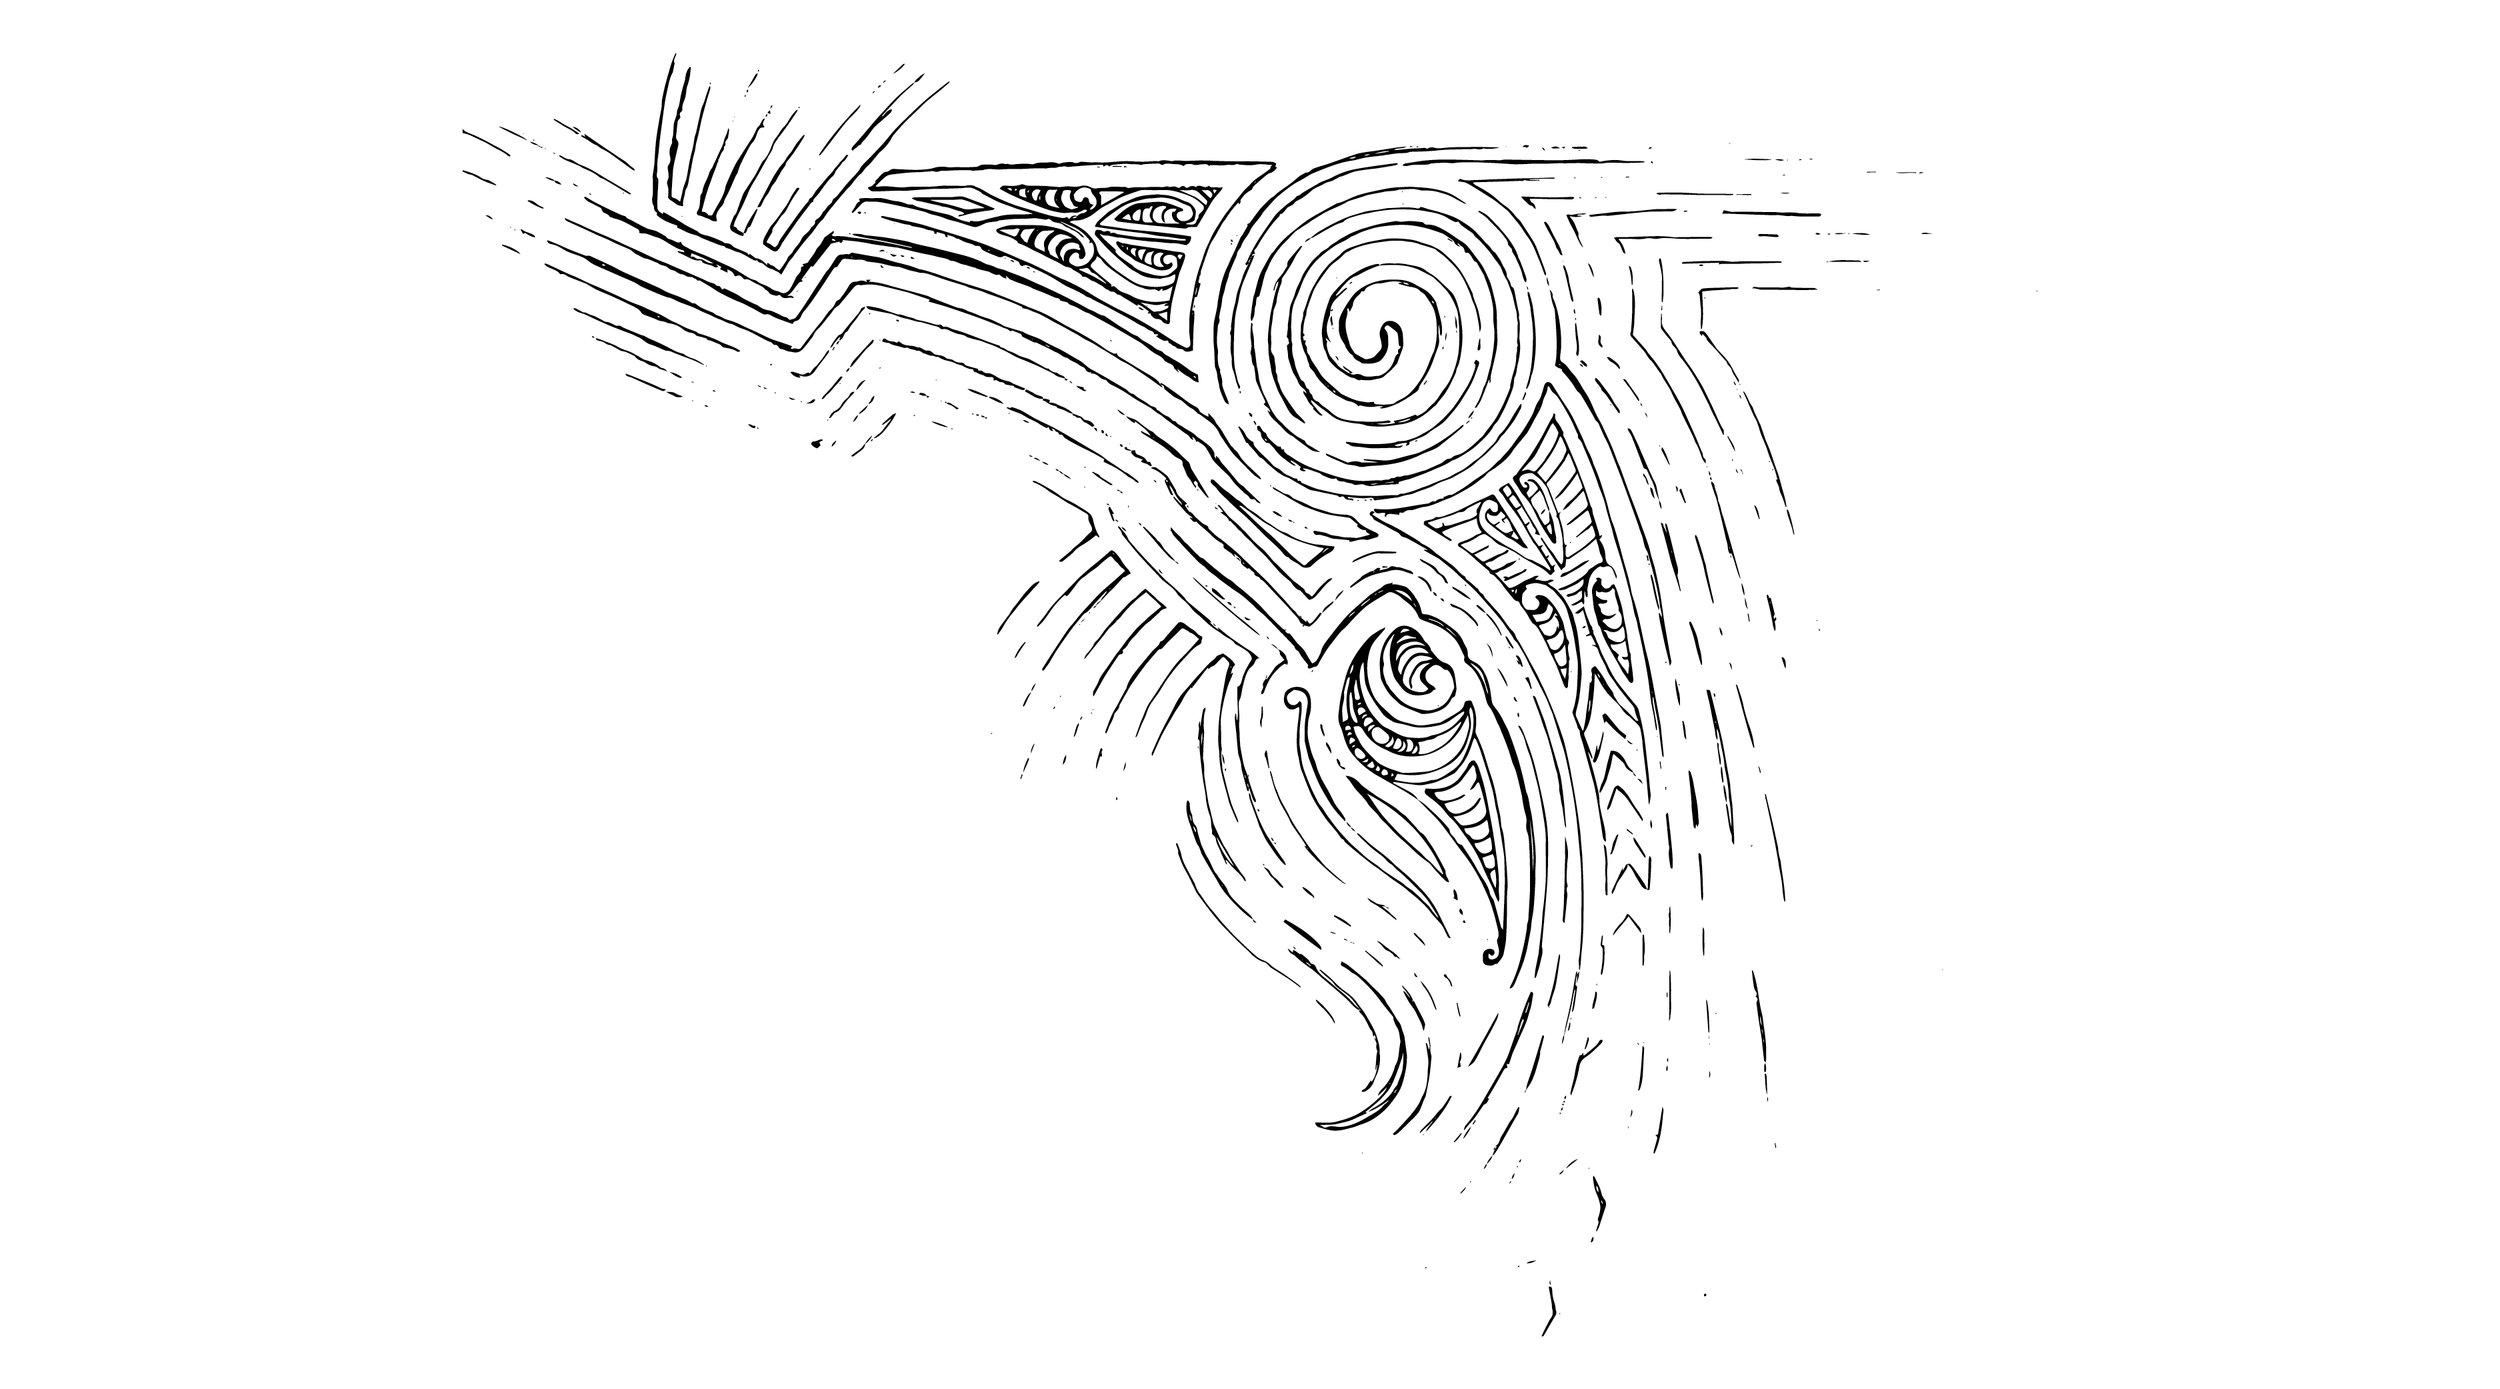 RBNZ_MaoriMotif_webportfolio_12.jpg